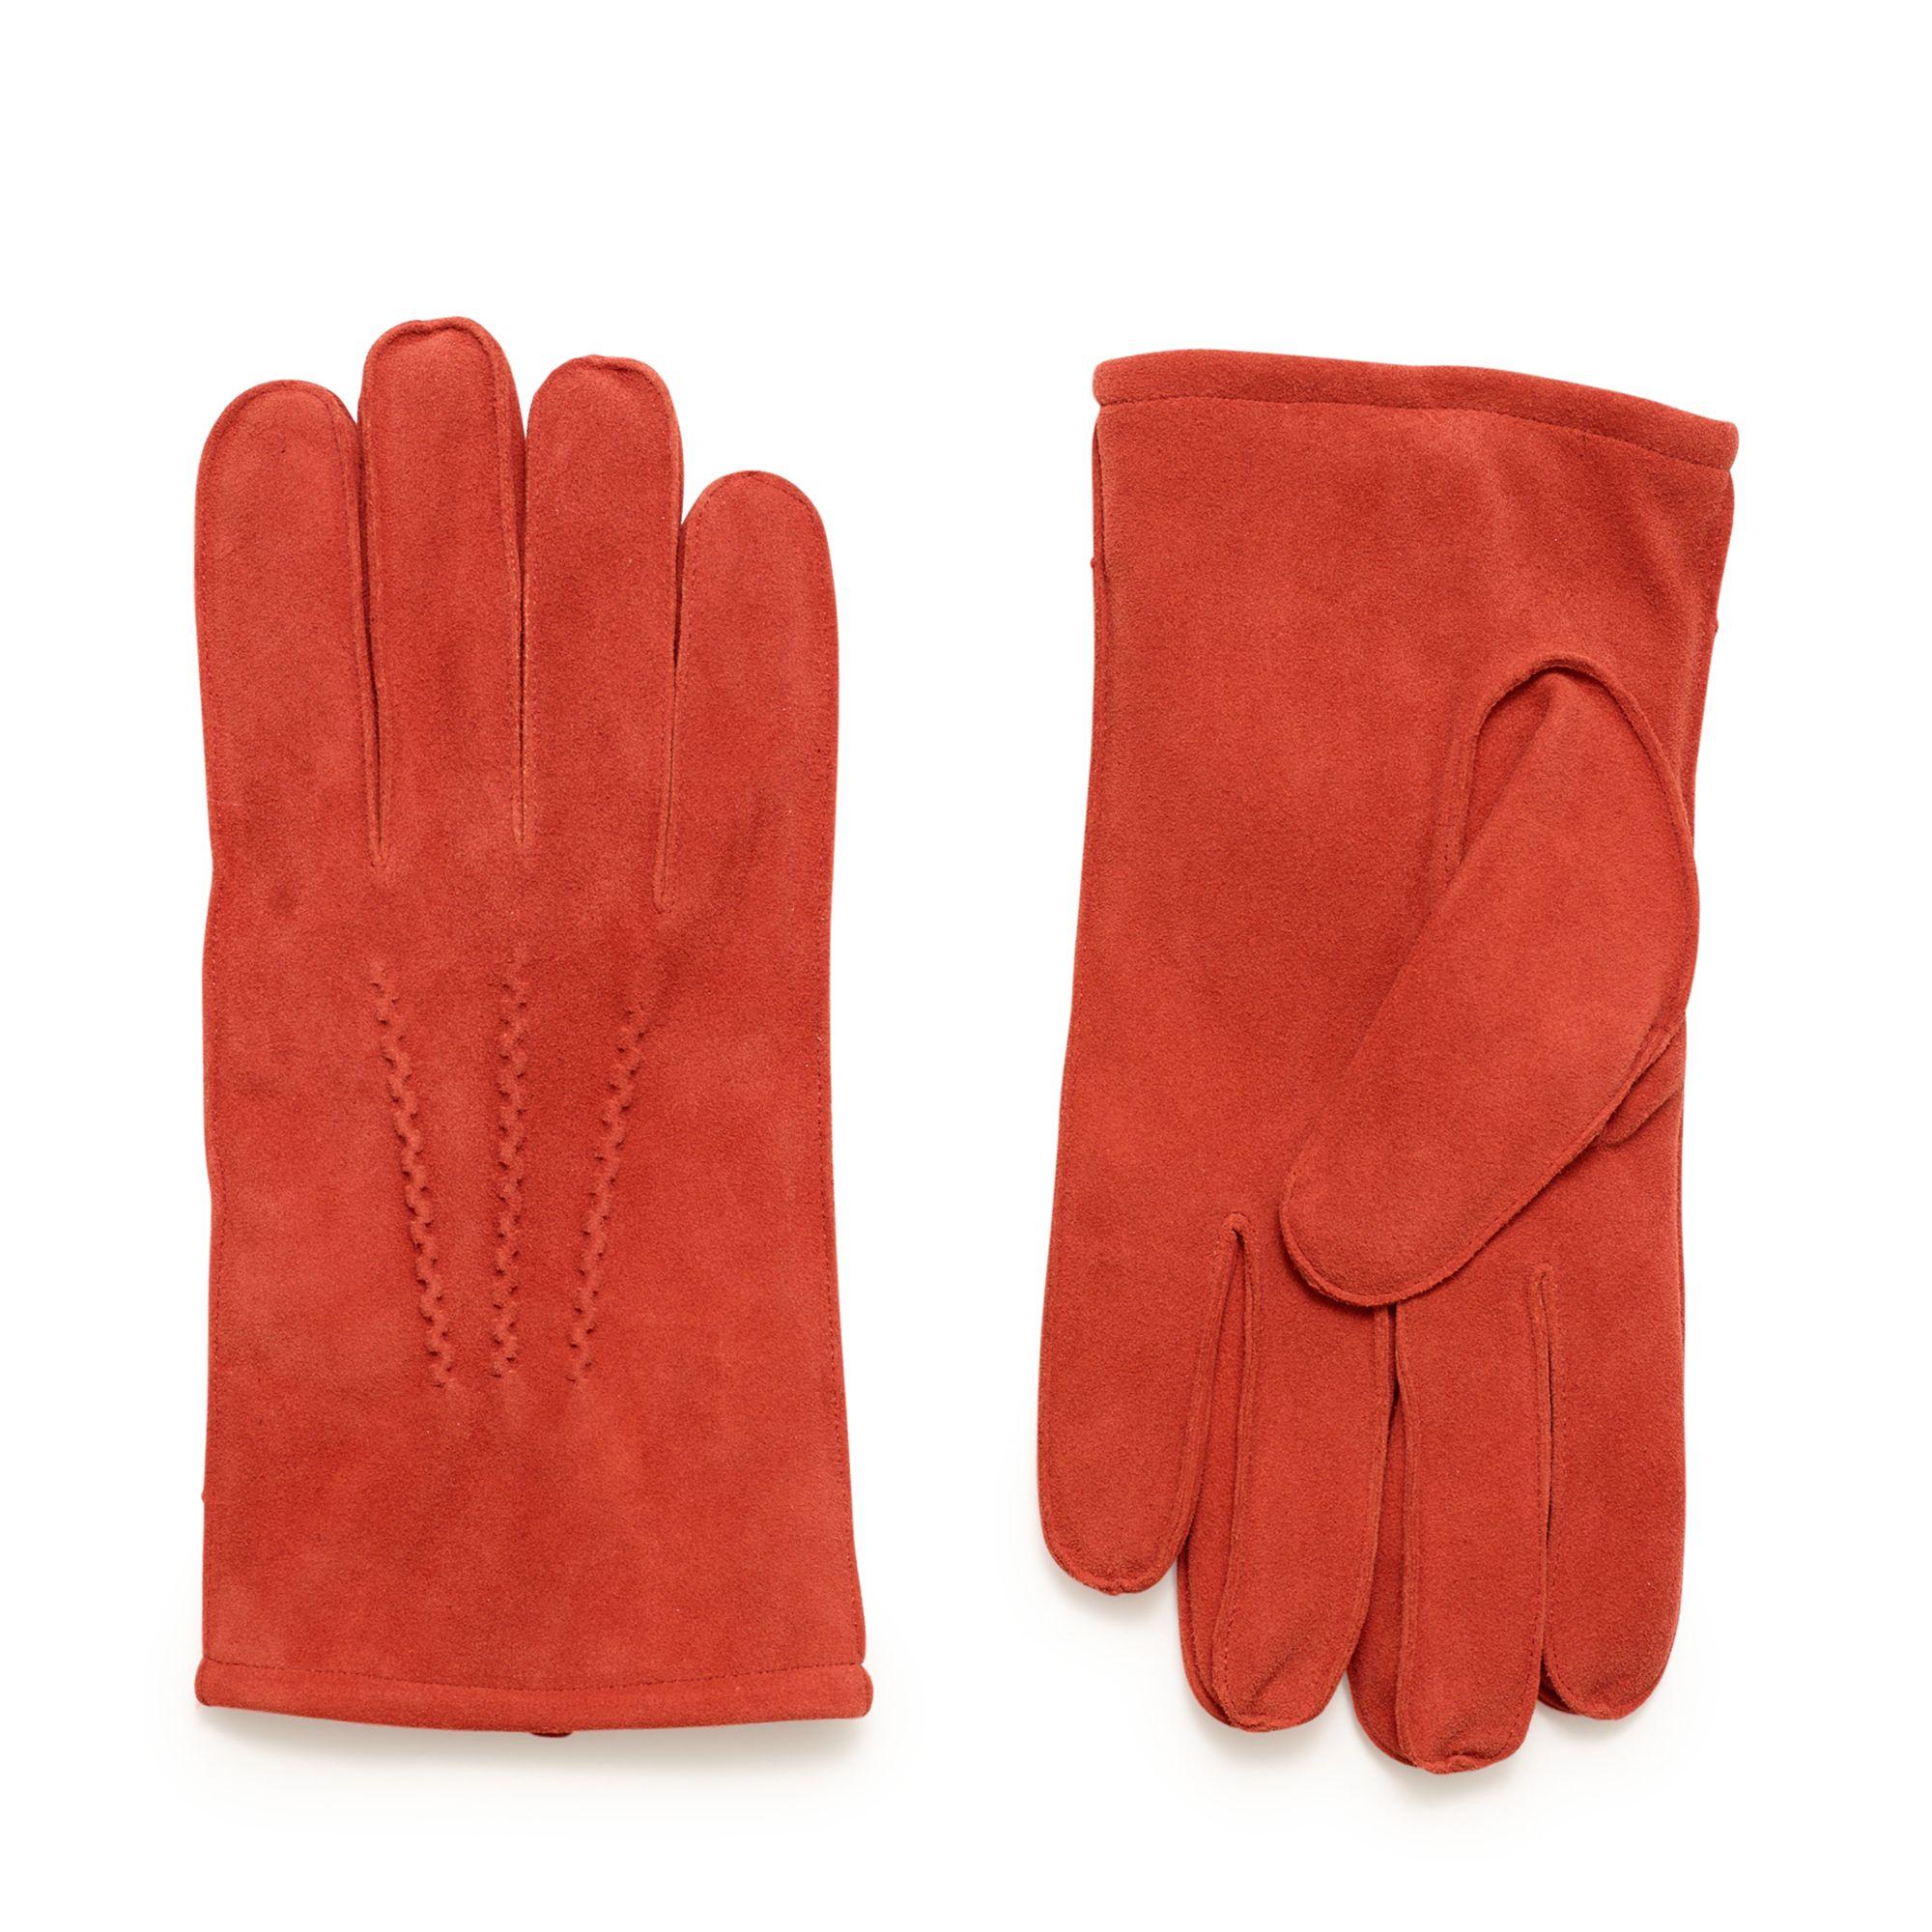 Handskmakaren Bisceglie handskar i mocka, herr, Orange, 9,5